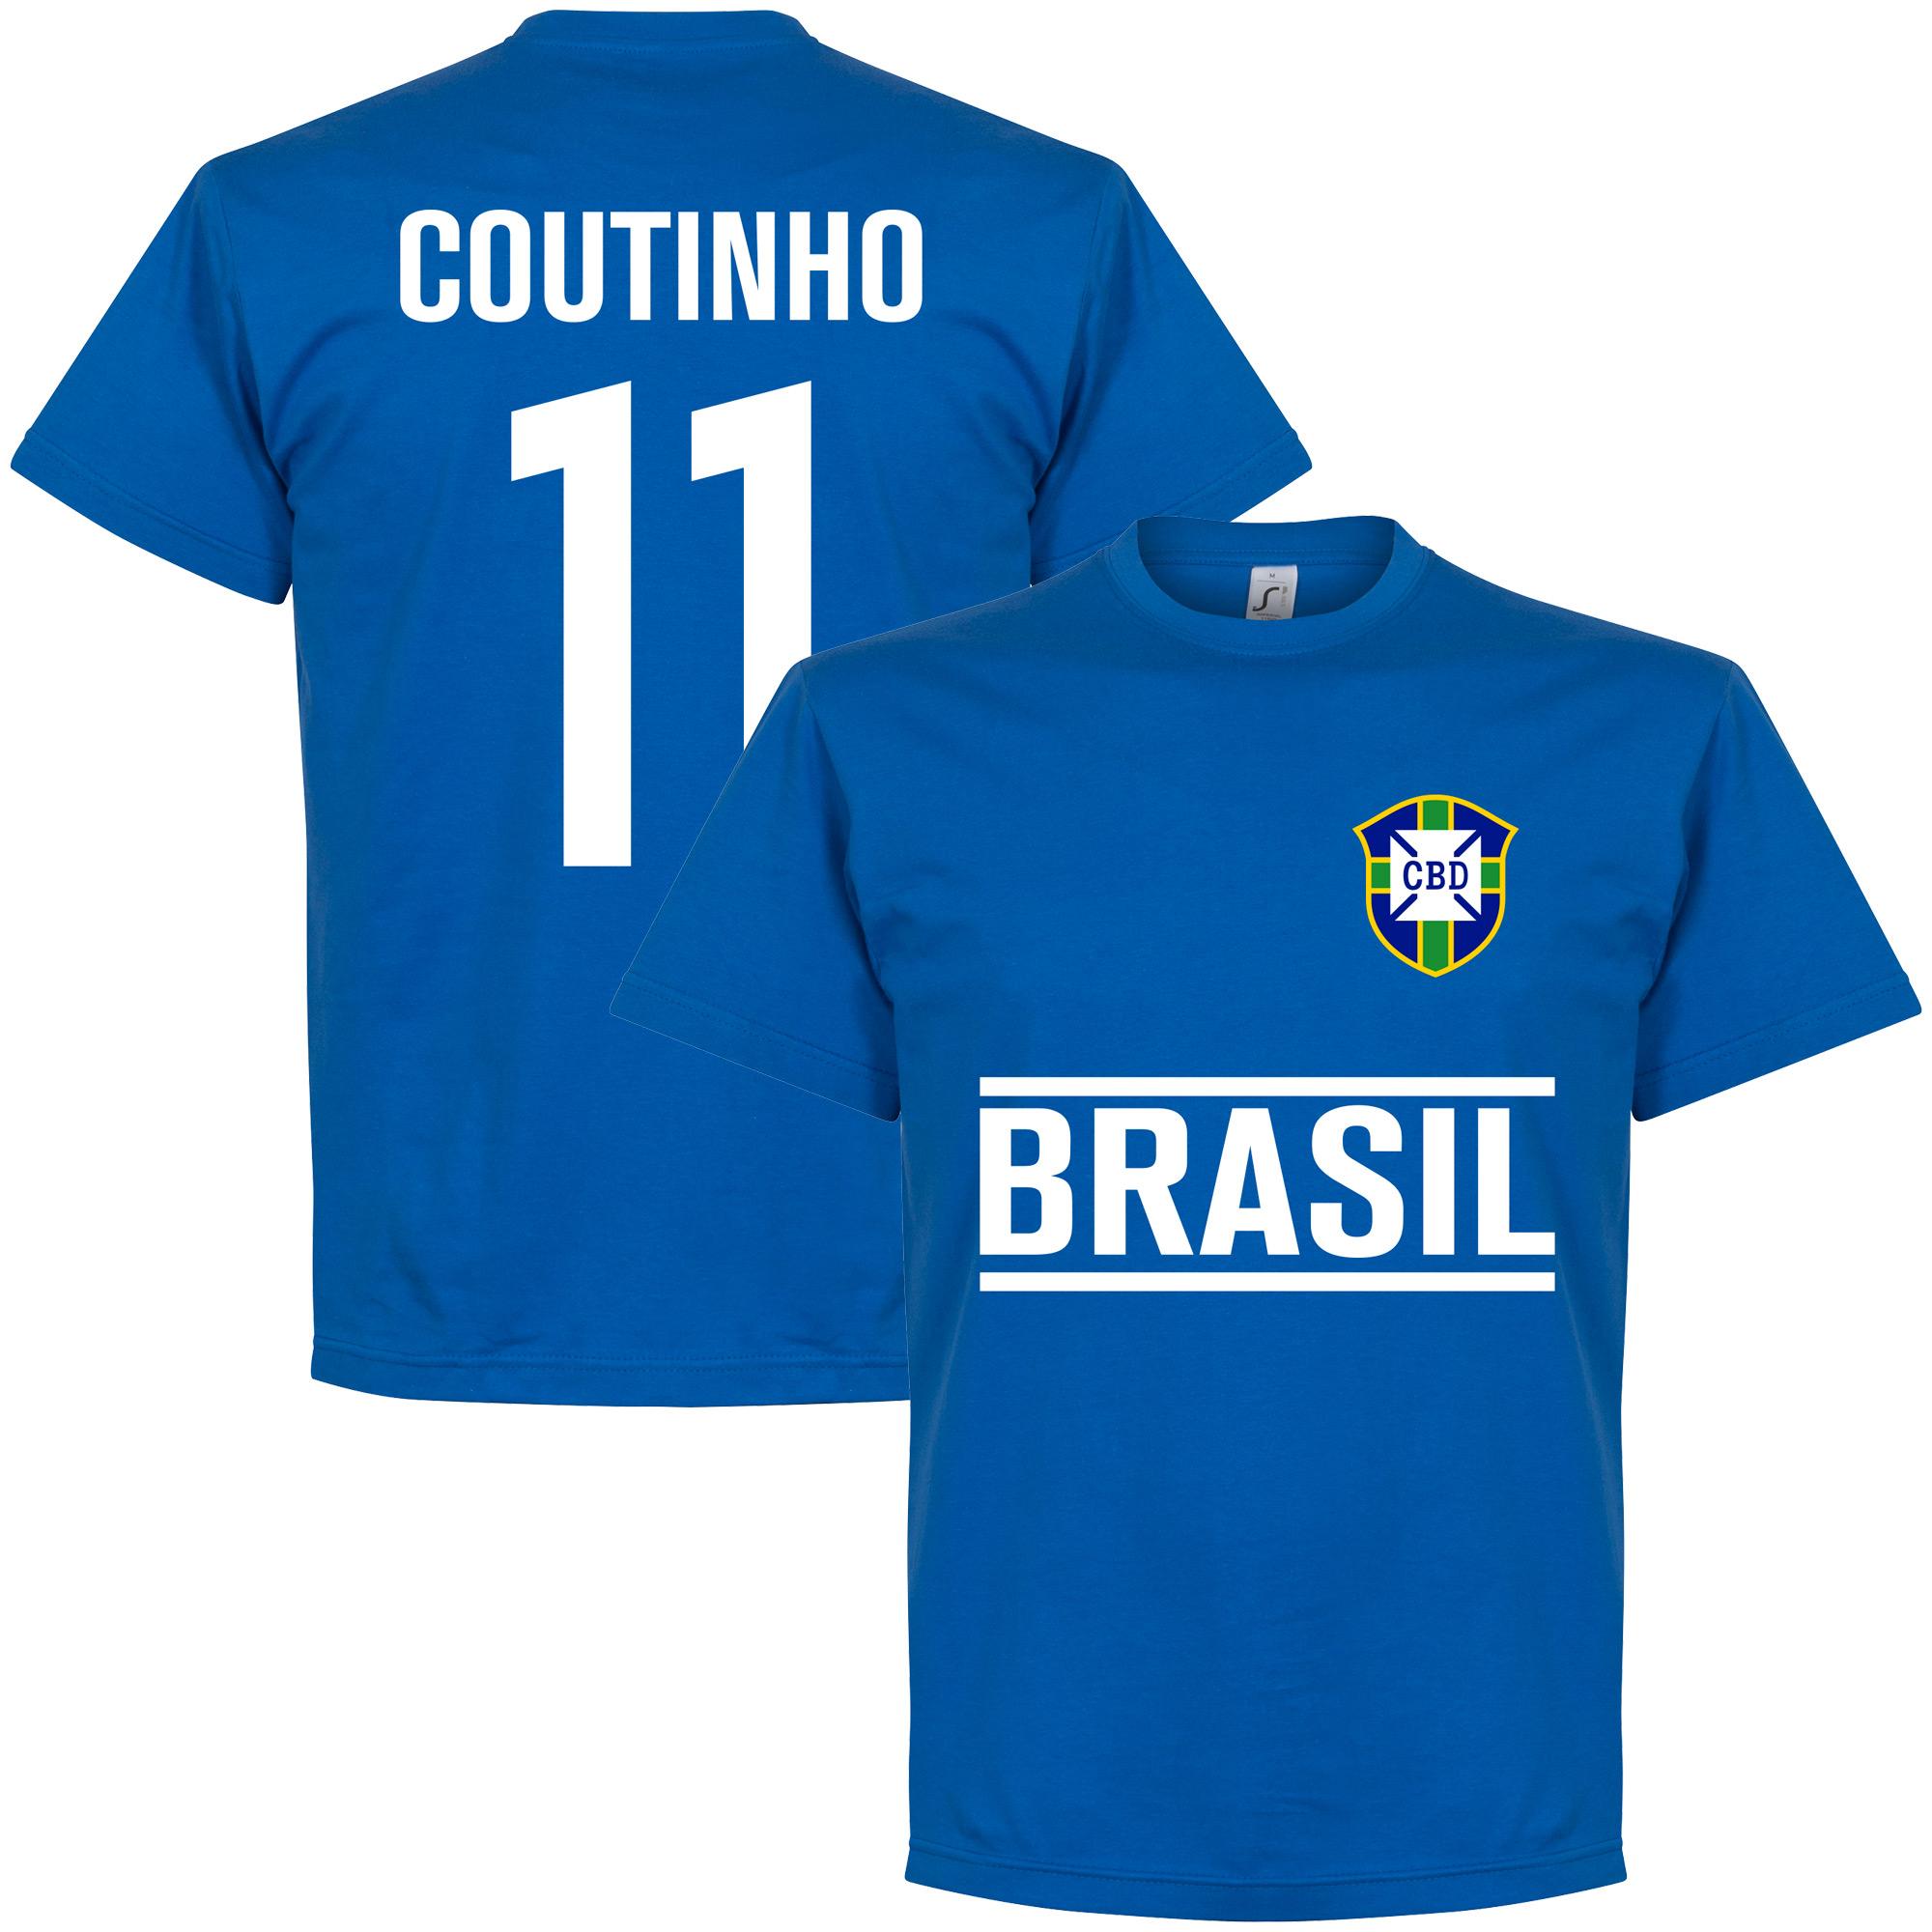 Brasil Coutinho Team Tee - Royal - XXL